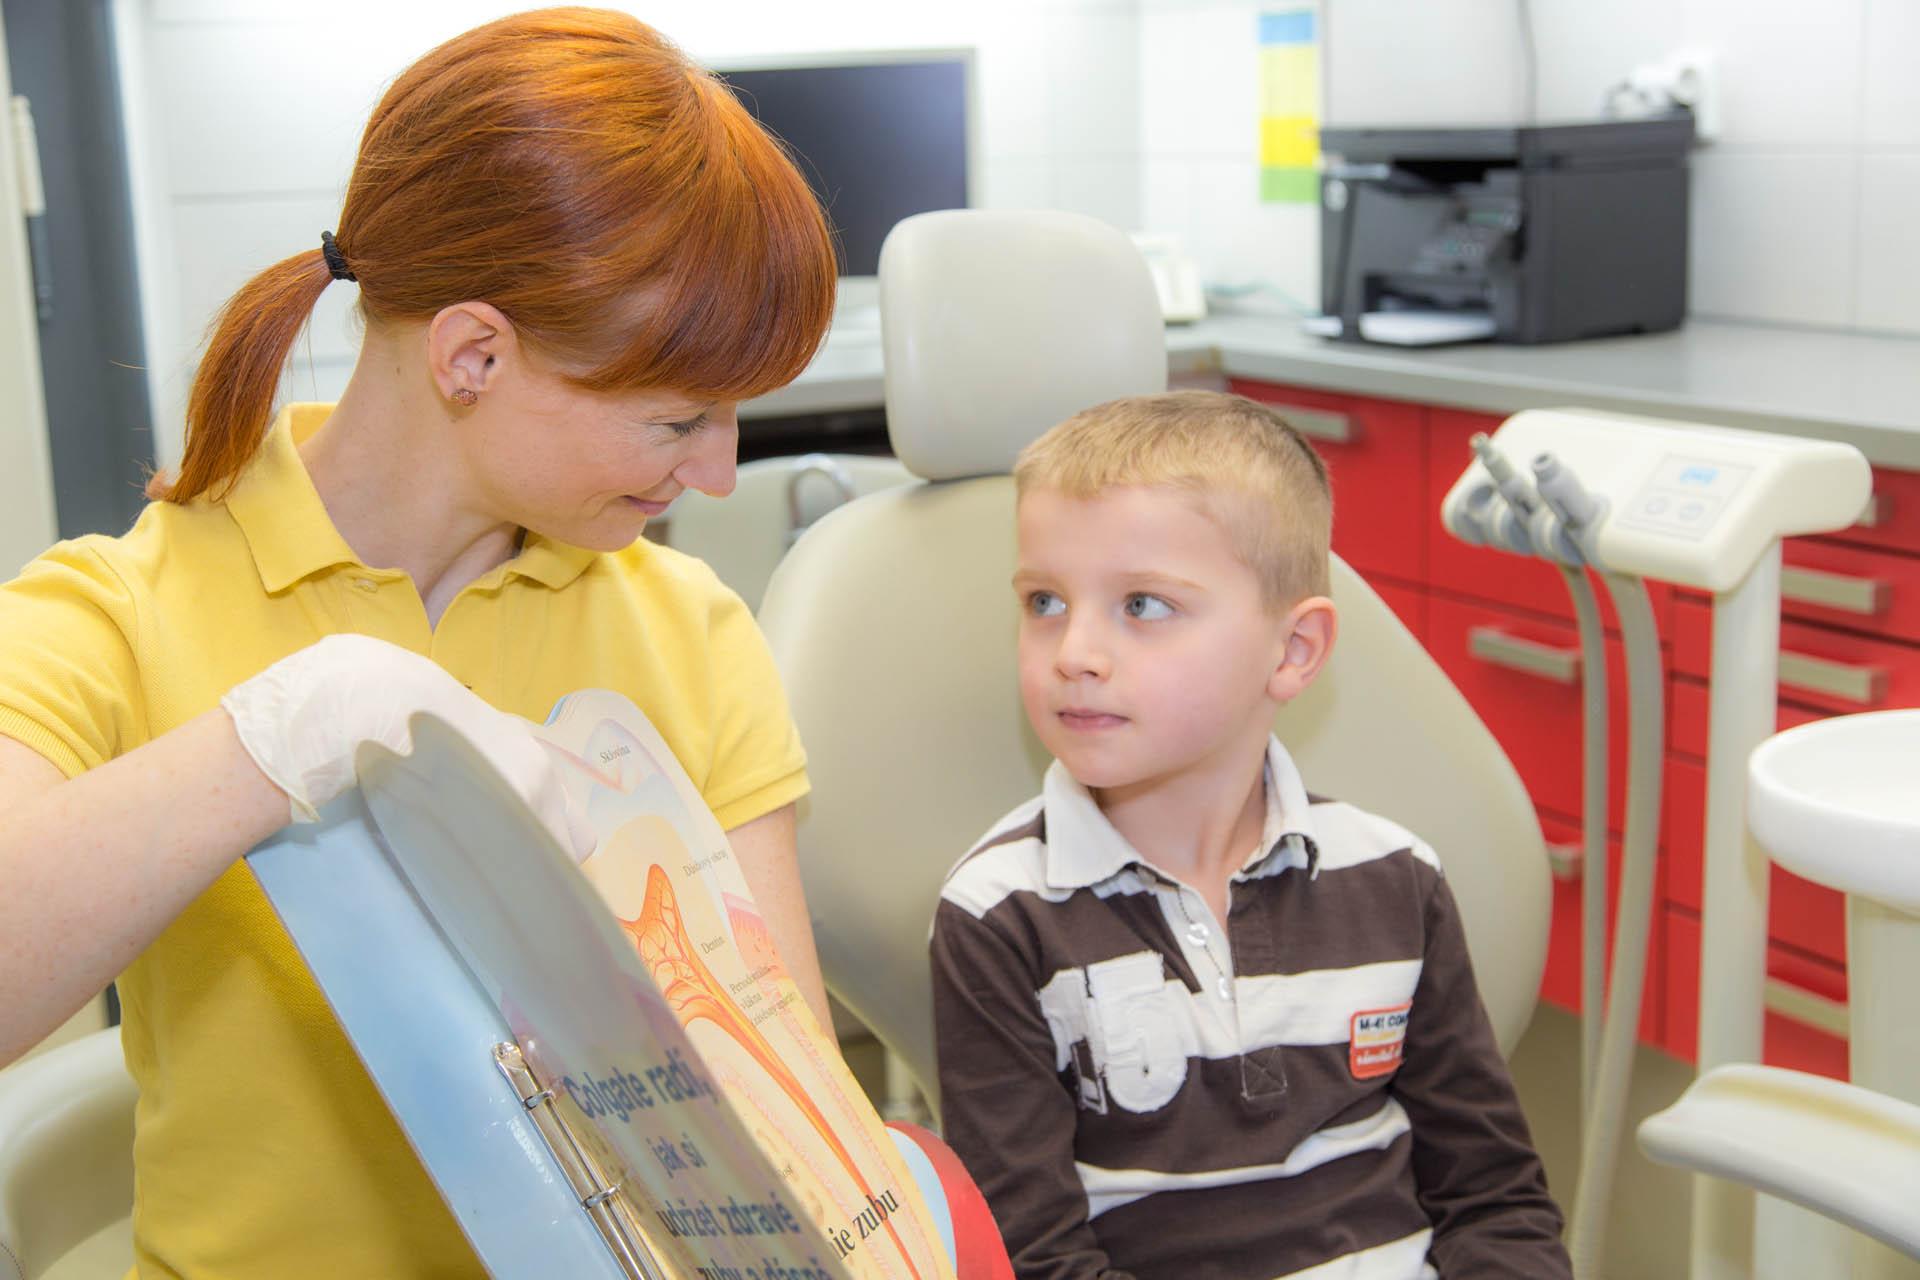 dentalni-hygiena-zuzana-pacovska-pratelske-prostredi-deti